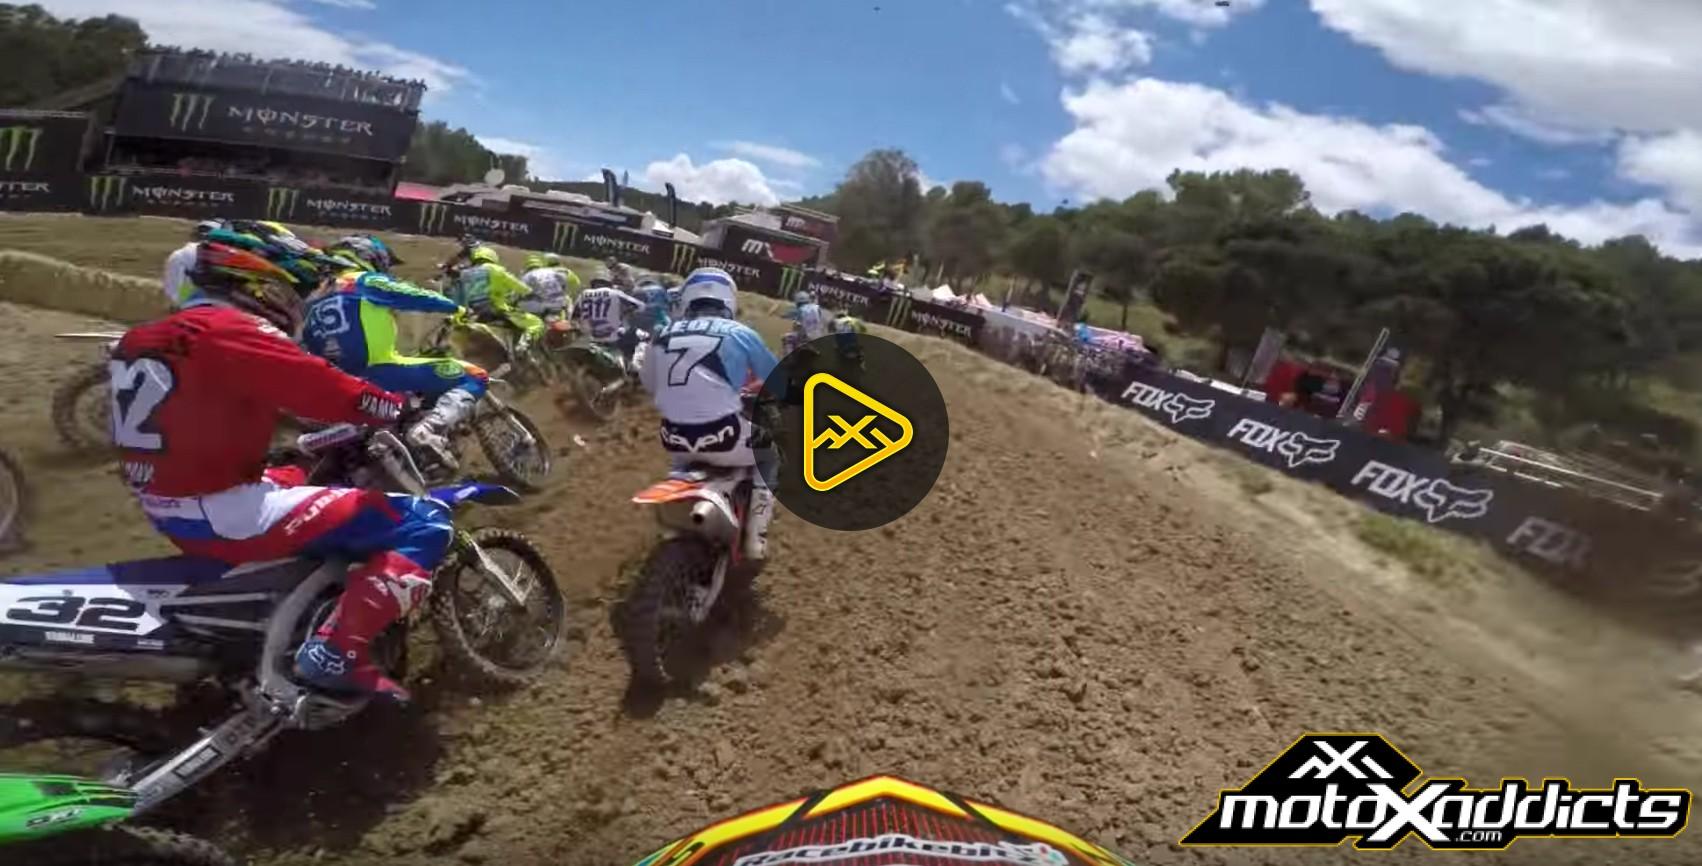 Helmet Cam: Shaun Simpson at 2016 MXGP of Spain